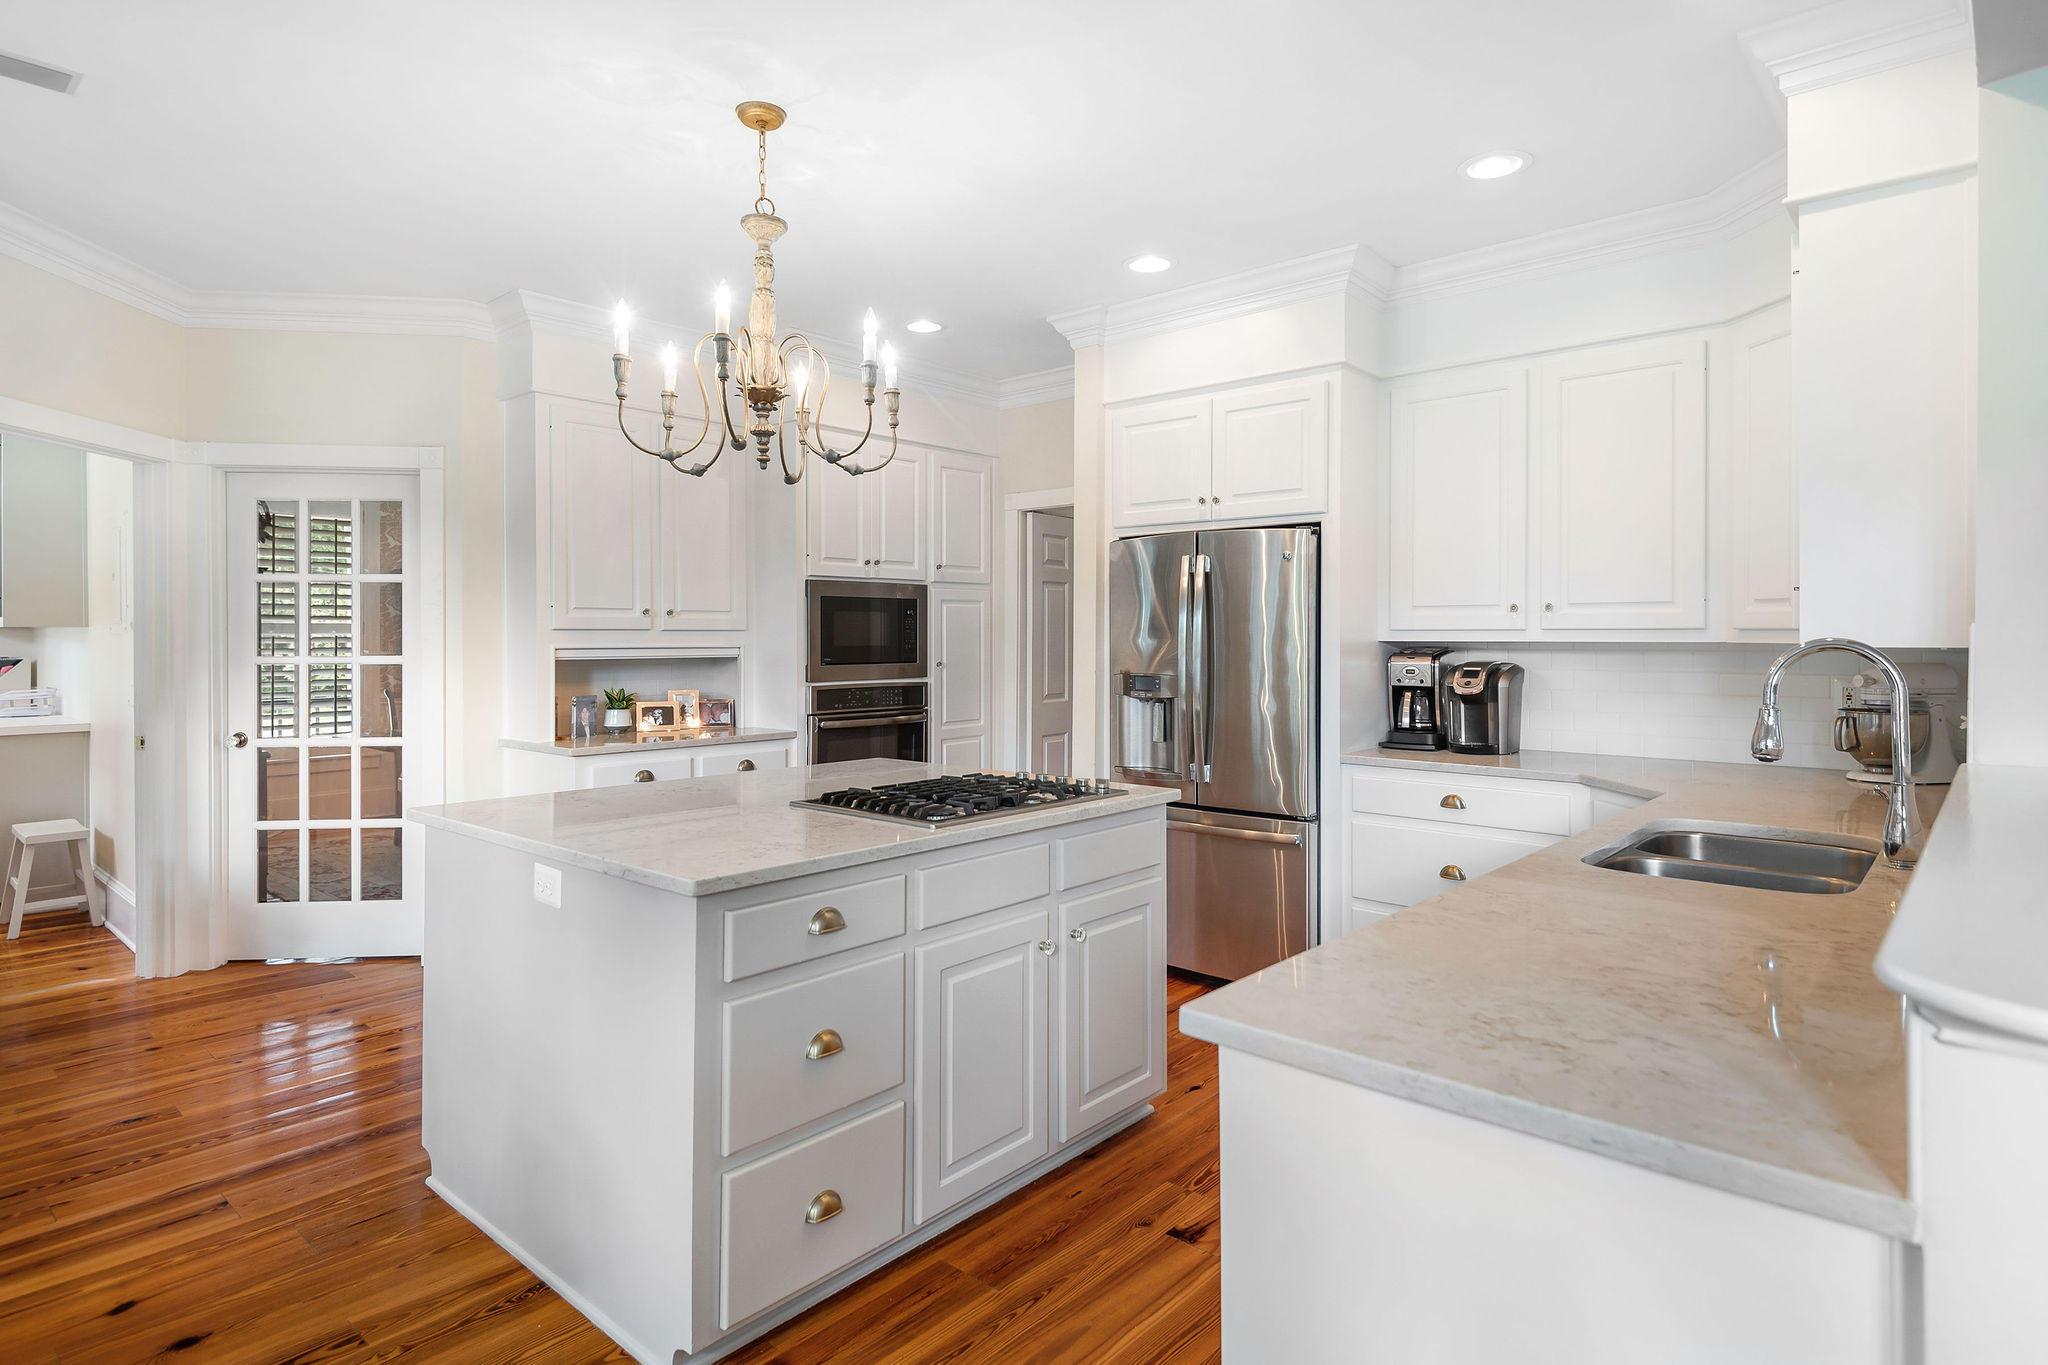 Country Club II Homes For Sale - 1482 Burningtree, Charleston, SC - 51